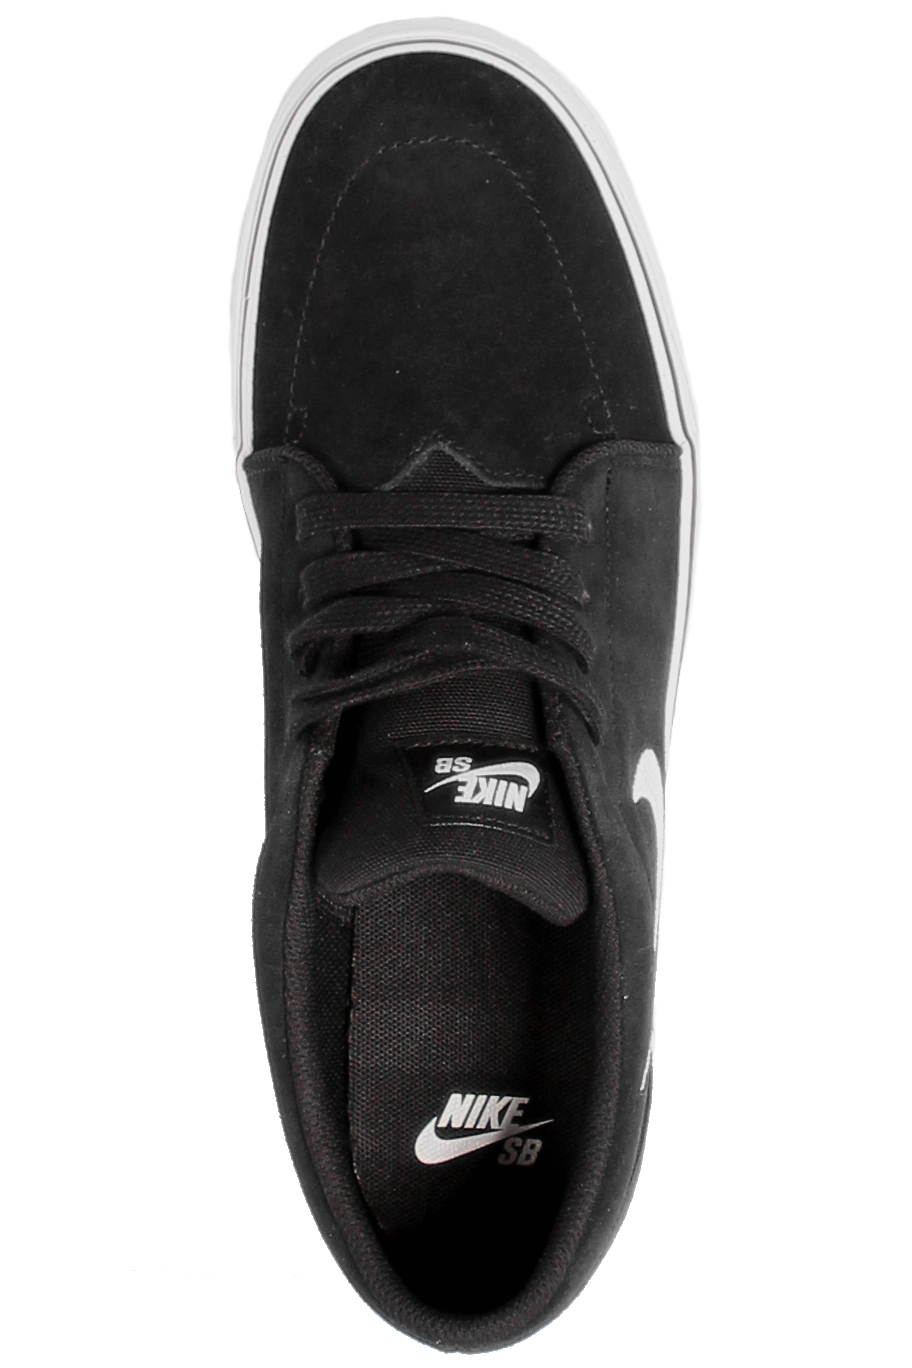 Buty Nike Satire (Black/White)